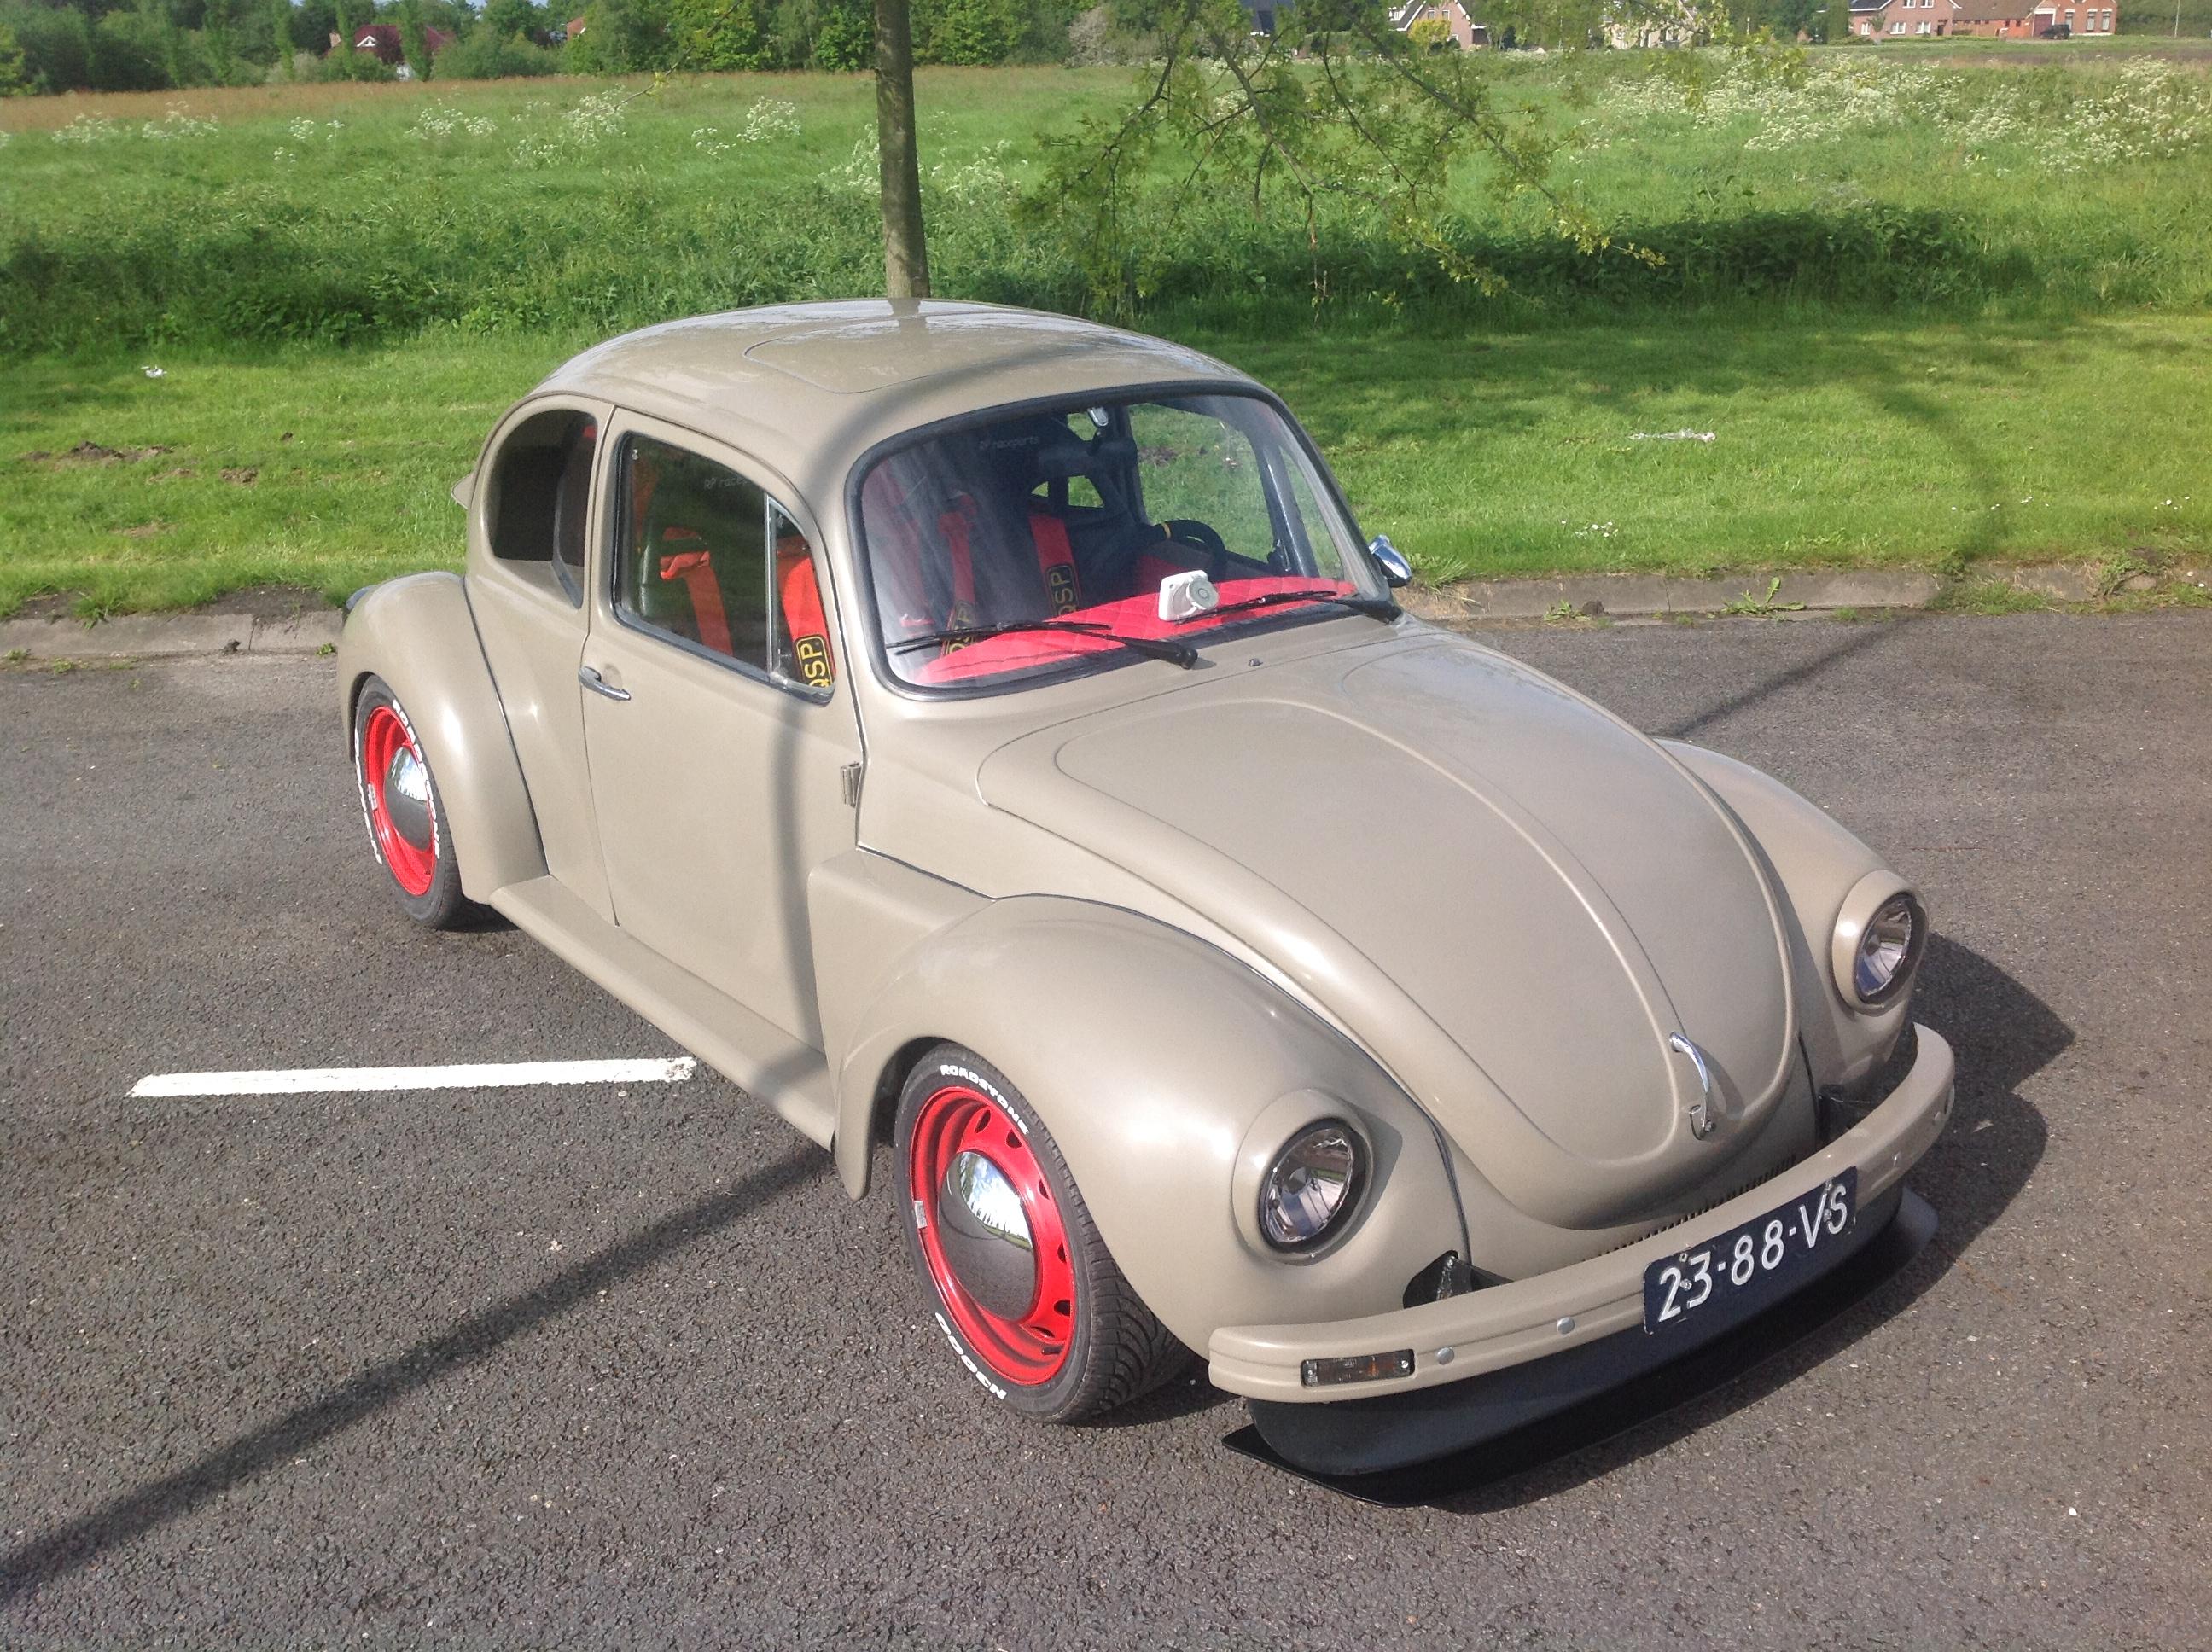 VW Bug Sti 2 0 turbo project build 350HP - JMSpeedshop !